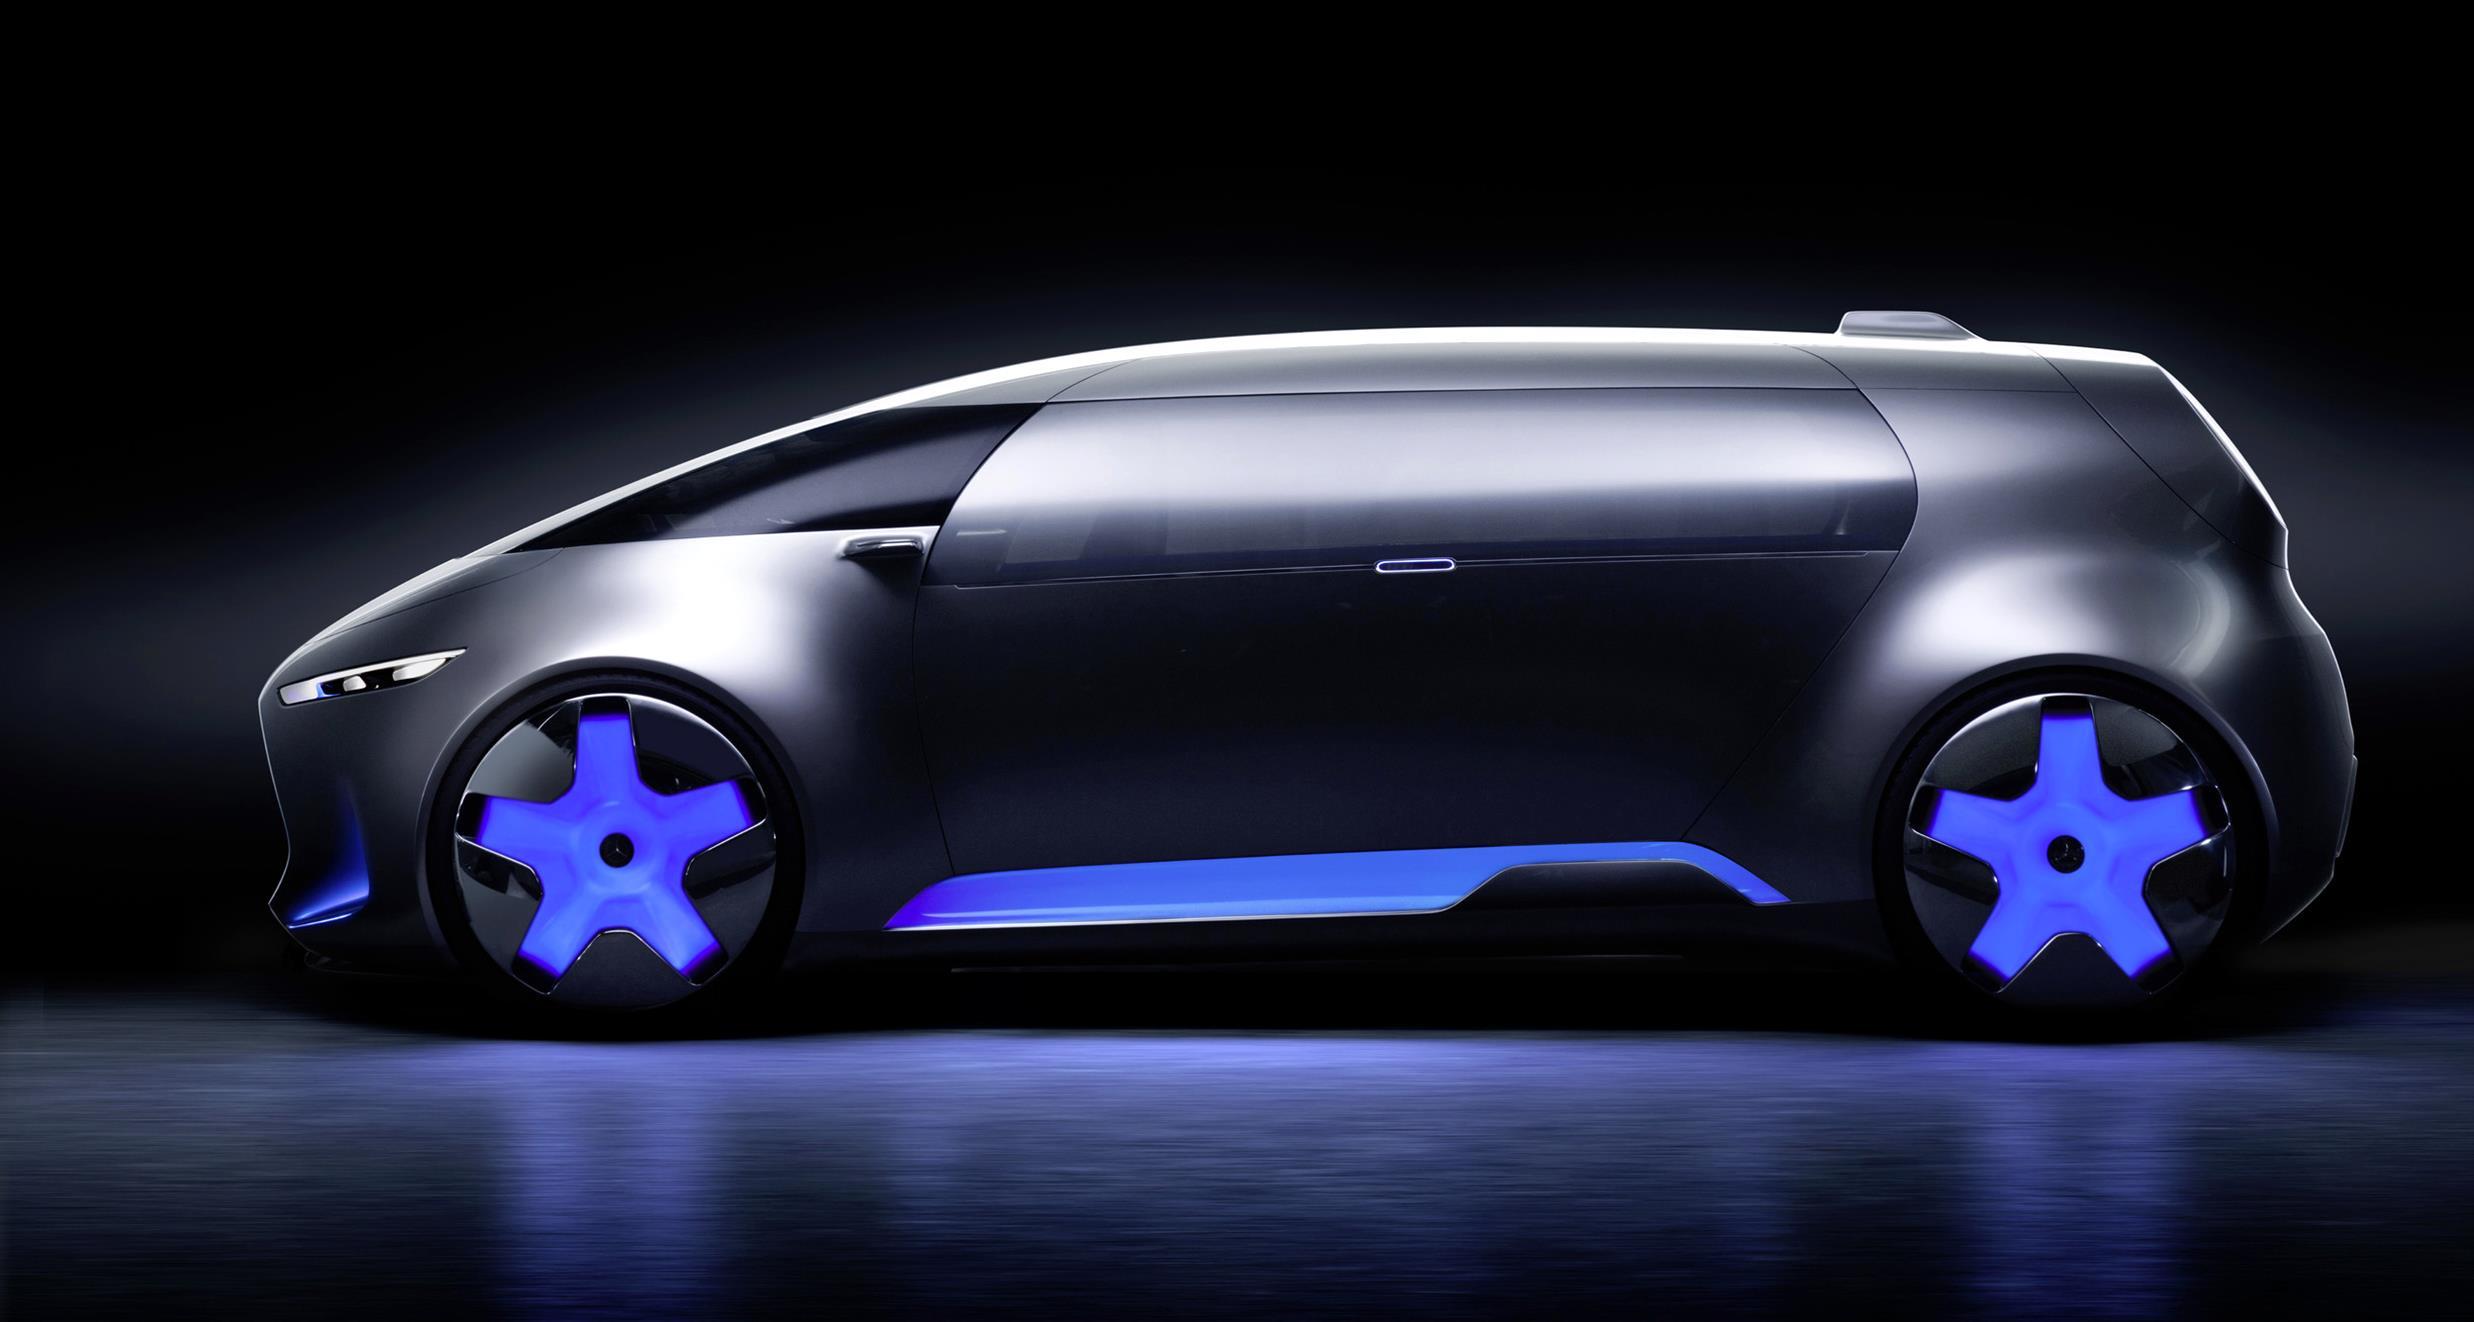 mercedes-benz-vision-tokyo-concept-004-1-Mercedes Benz for urban hipsters